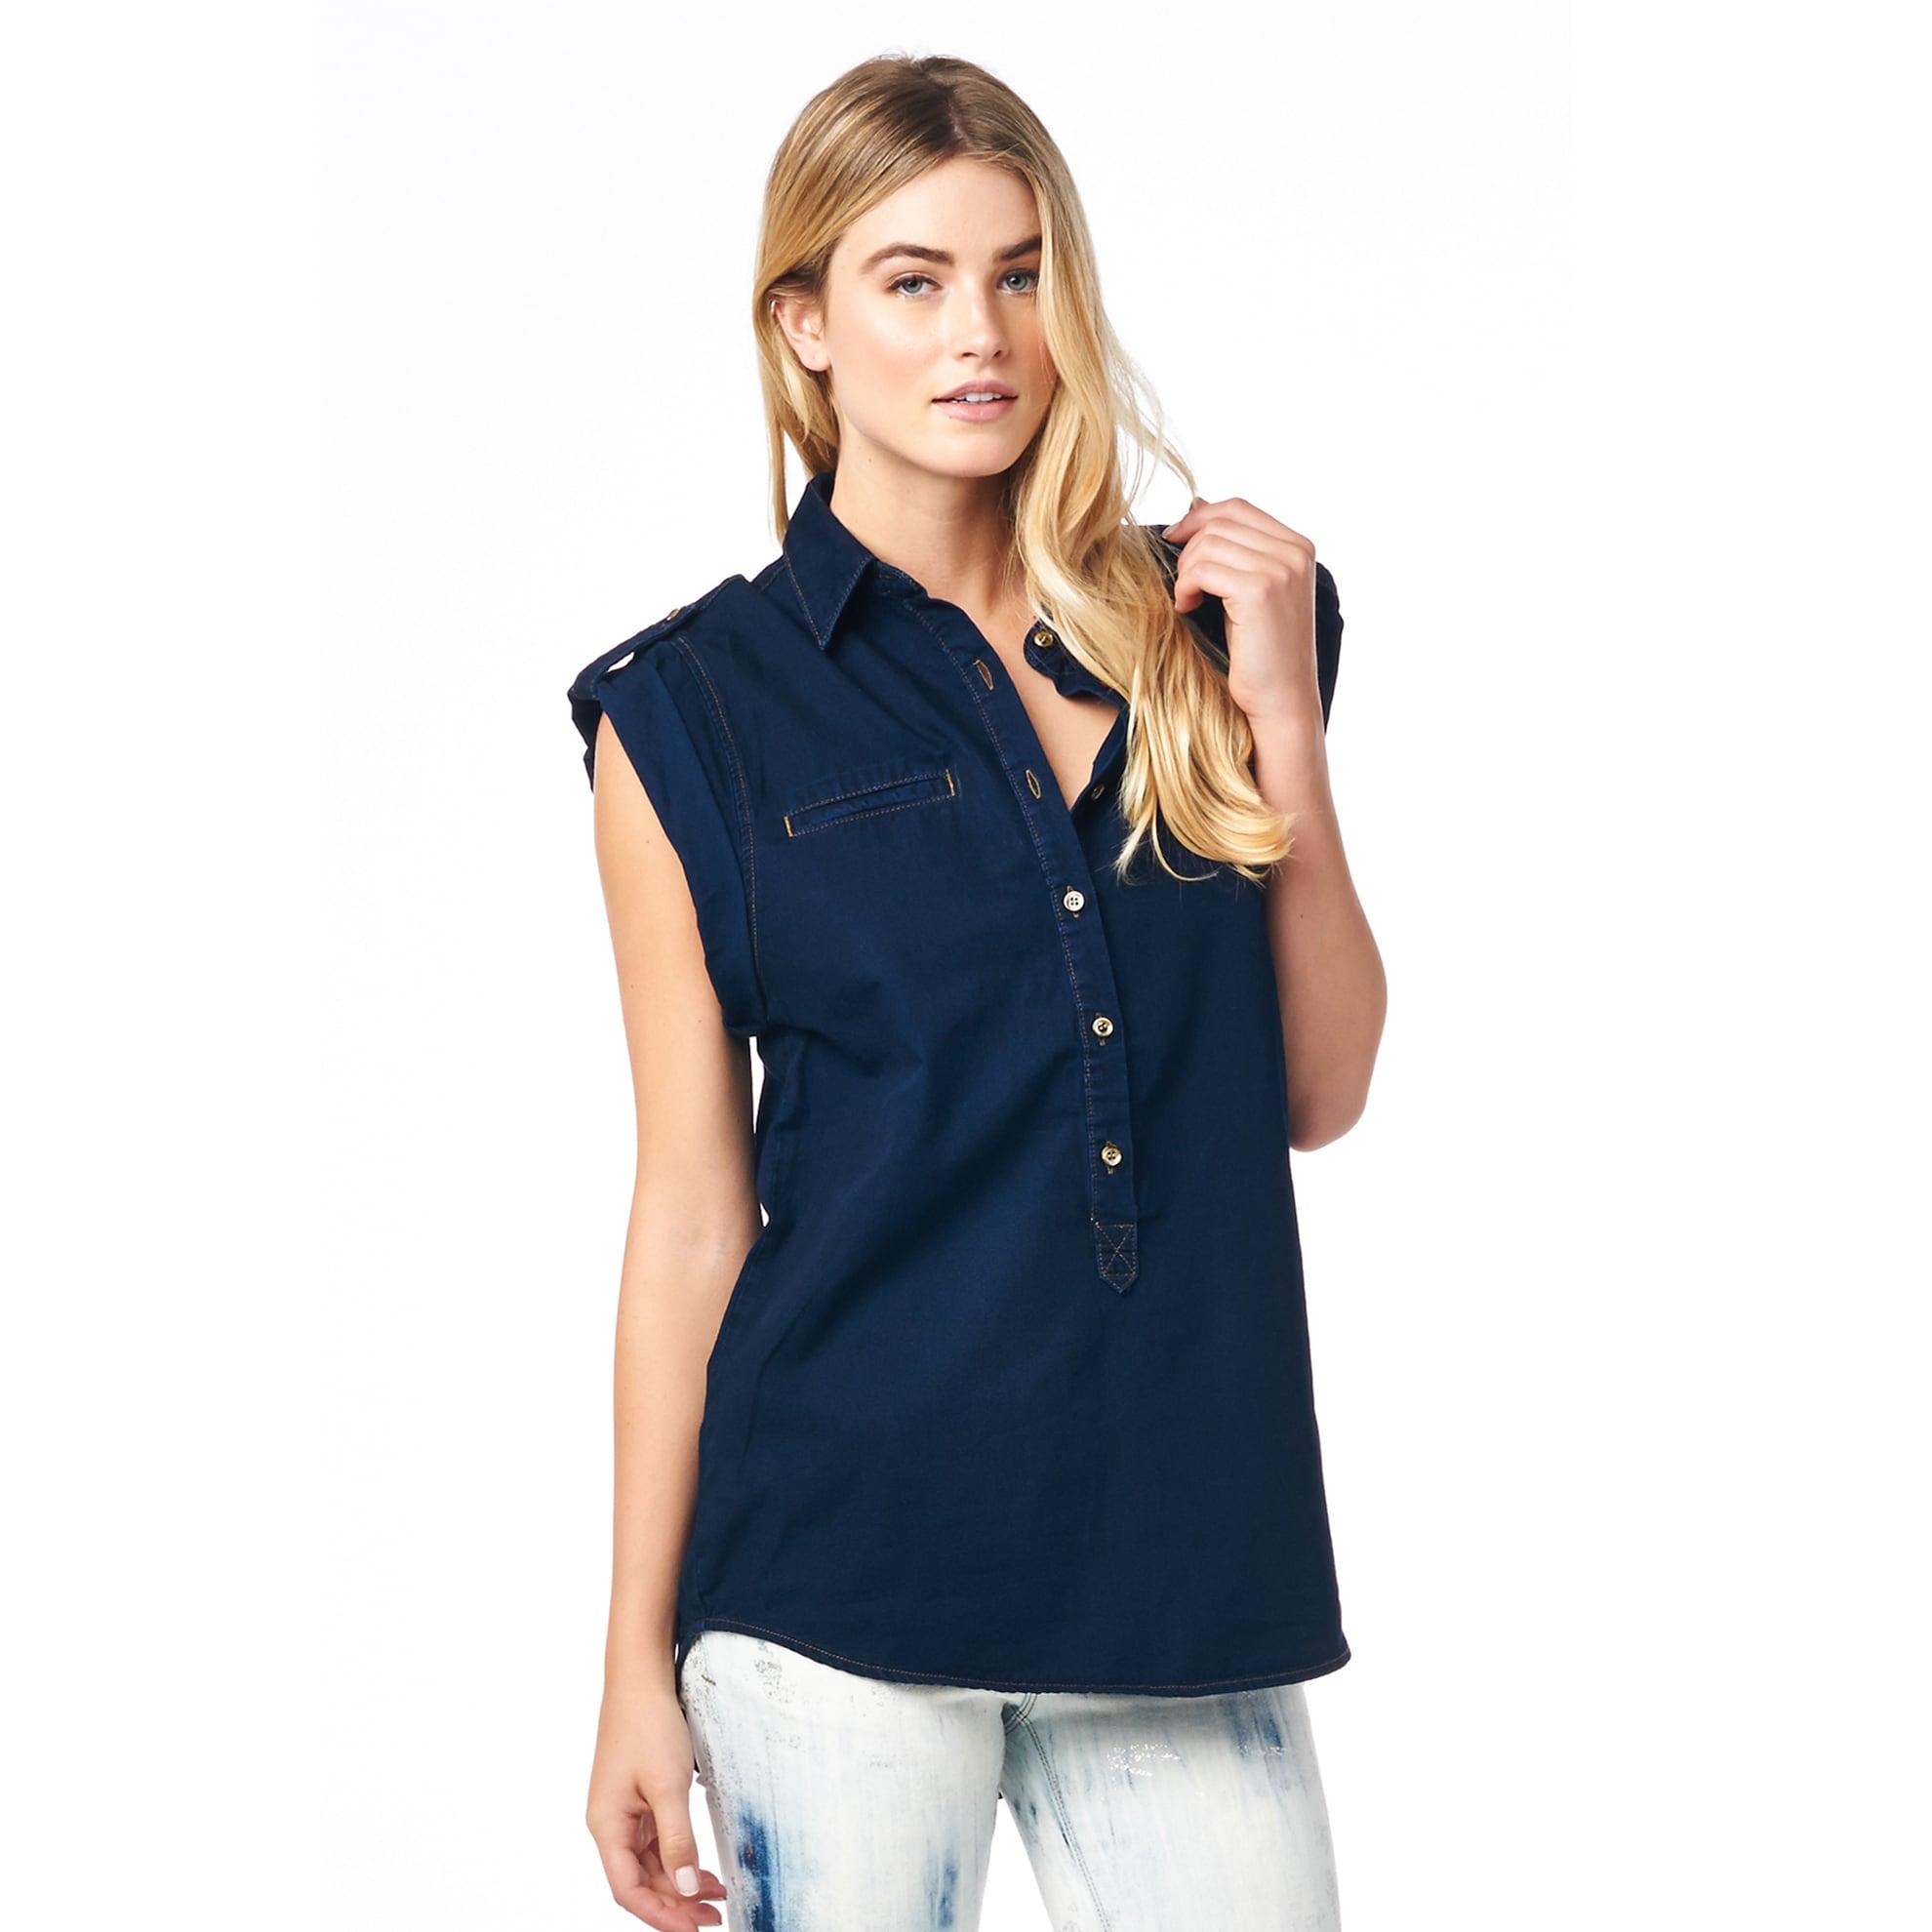 Cult Of Individuality Tao Women's Midnight Denim Shirt (X...